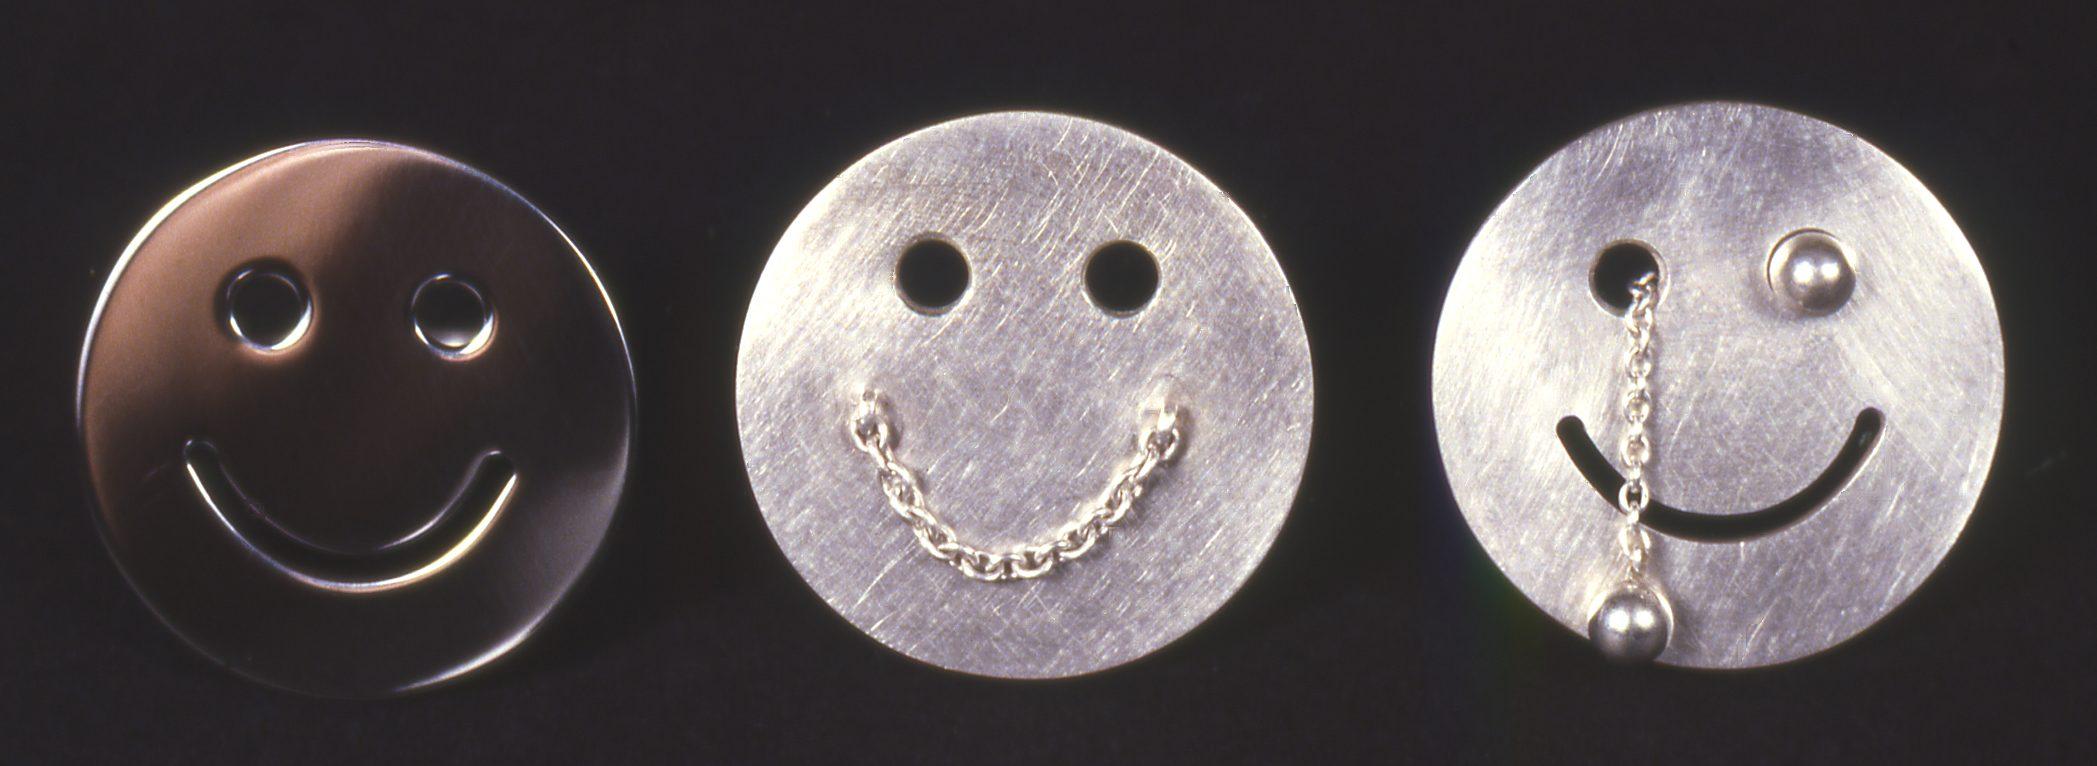 Susanne Klemm, Smiley rings, 1998. Foto met dank aan Susanne Klemm©